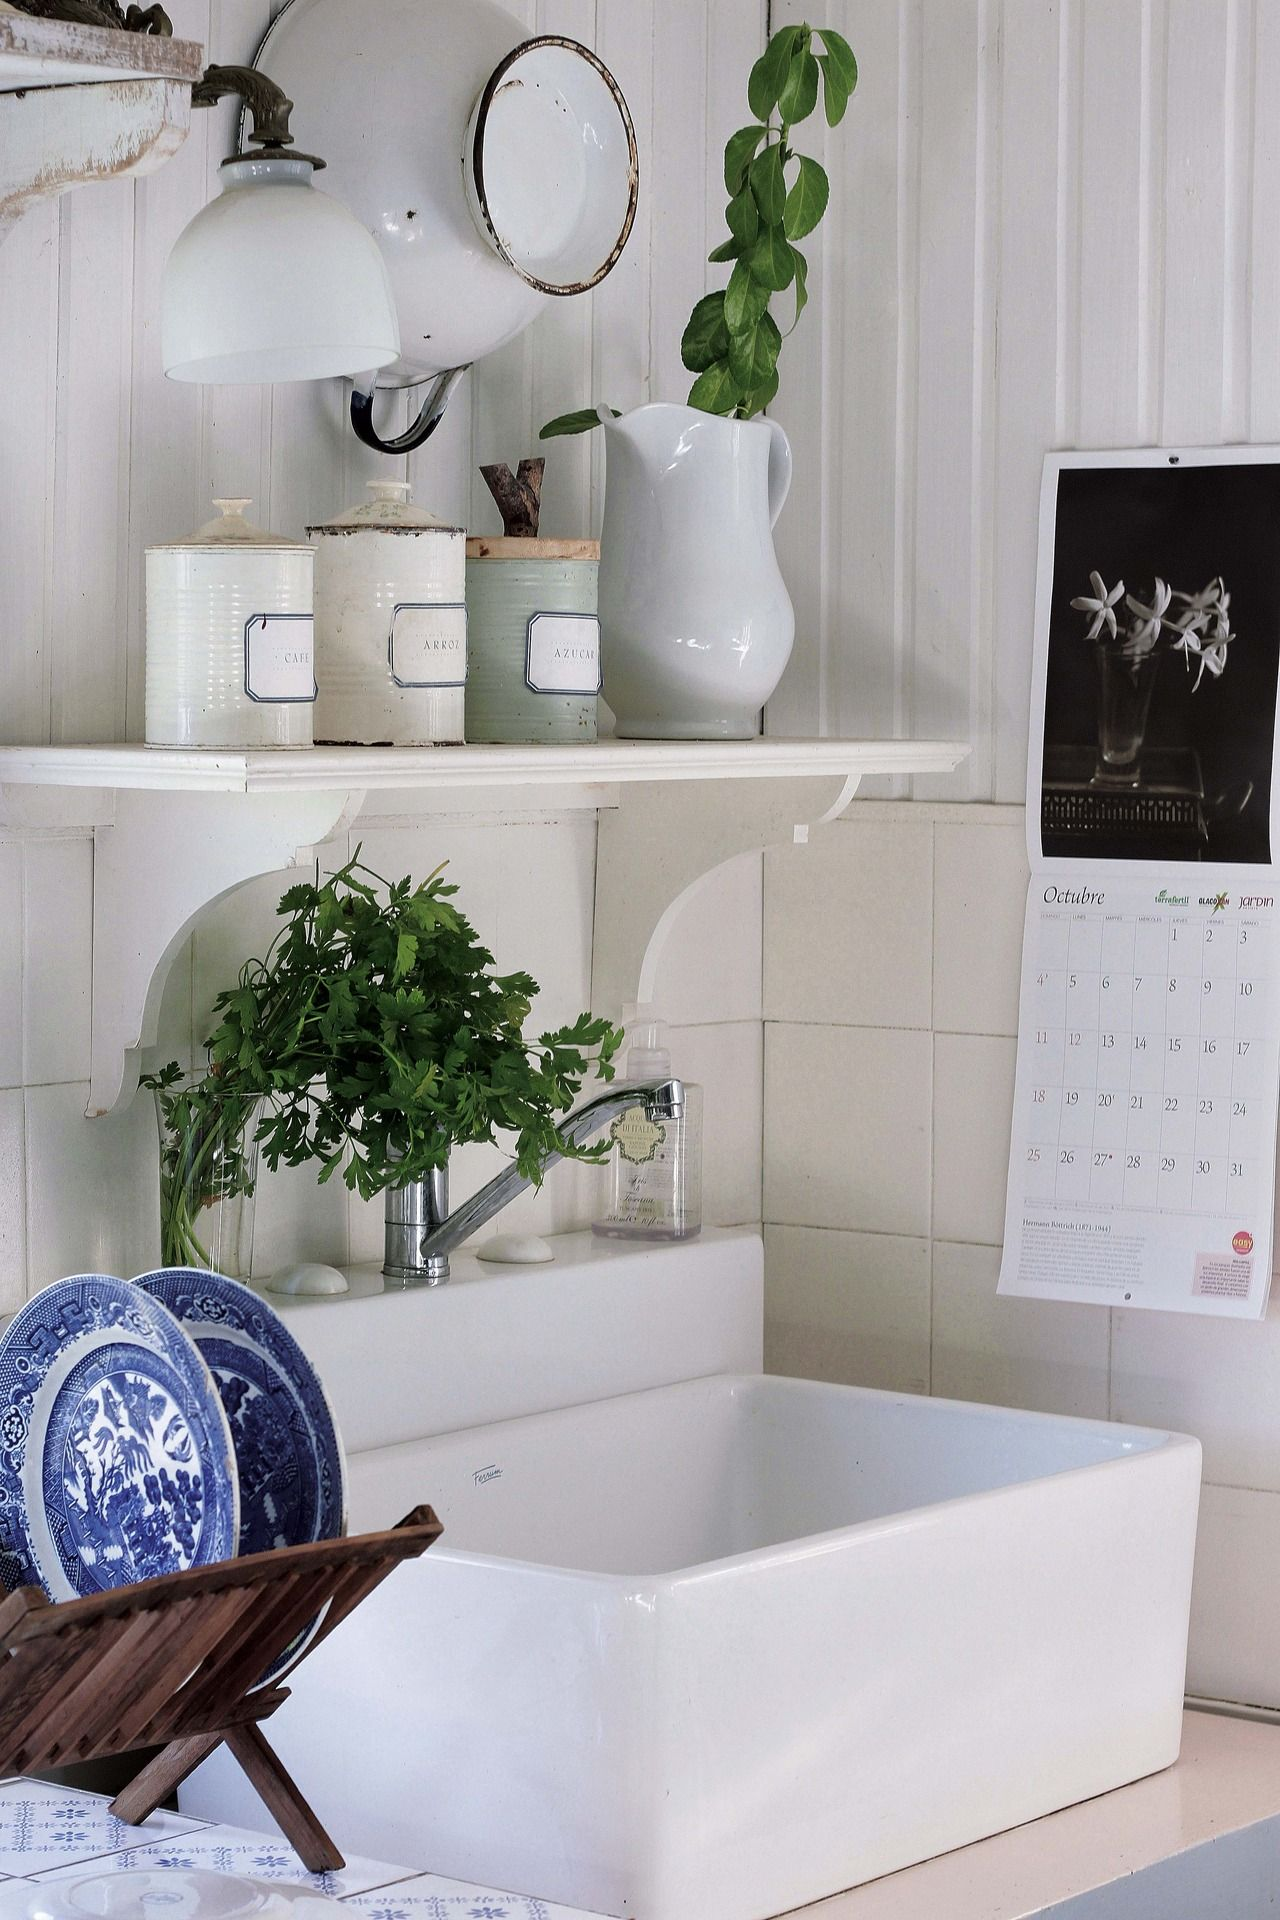 Explore Powder Room, Romantic Kitchen, And More